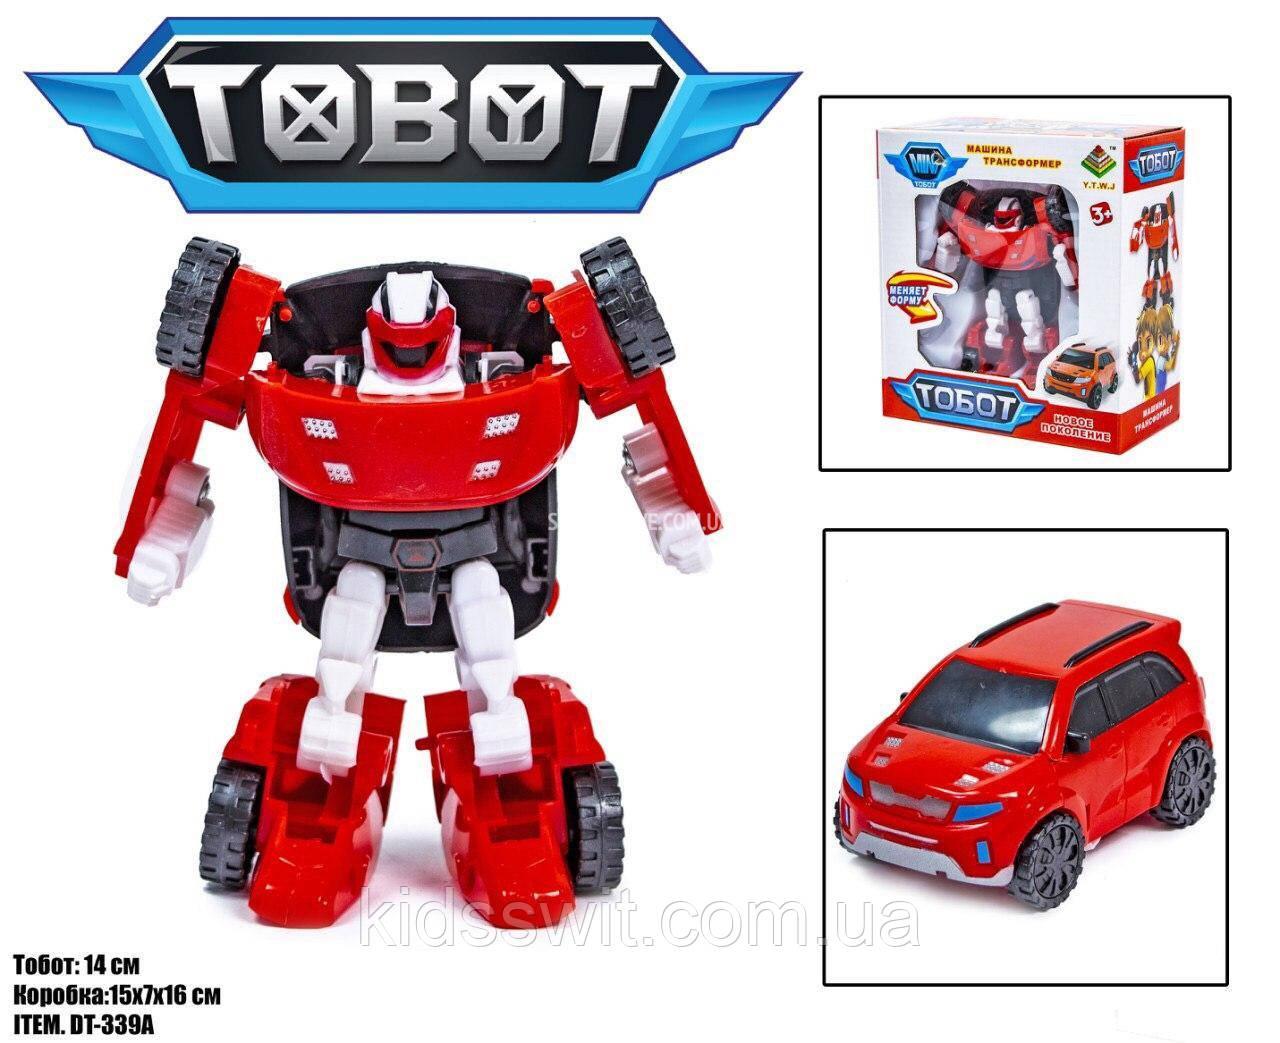 Робот-трансформер Тобот, в наявності 4 види, 339